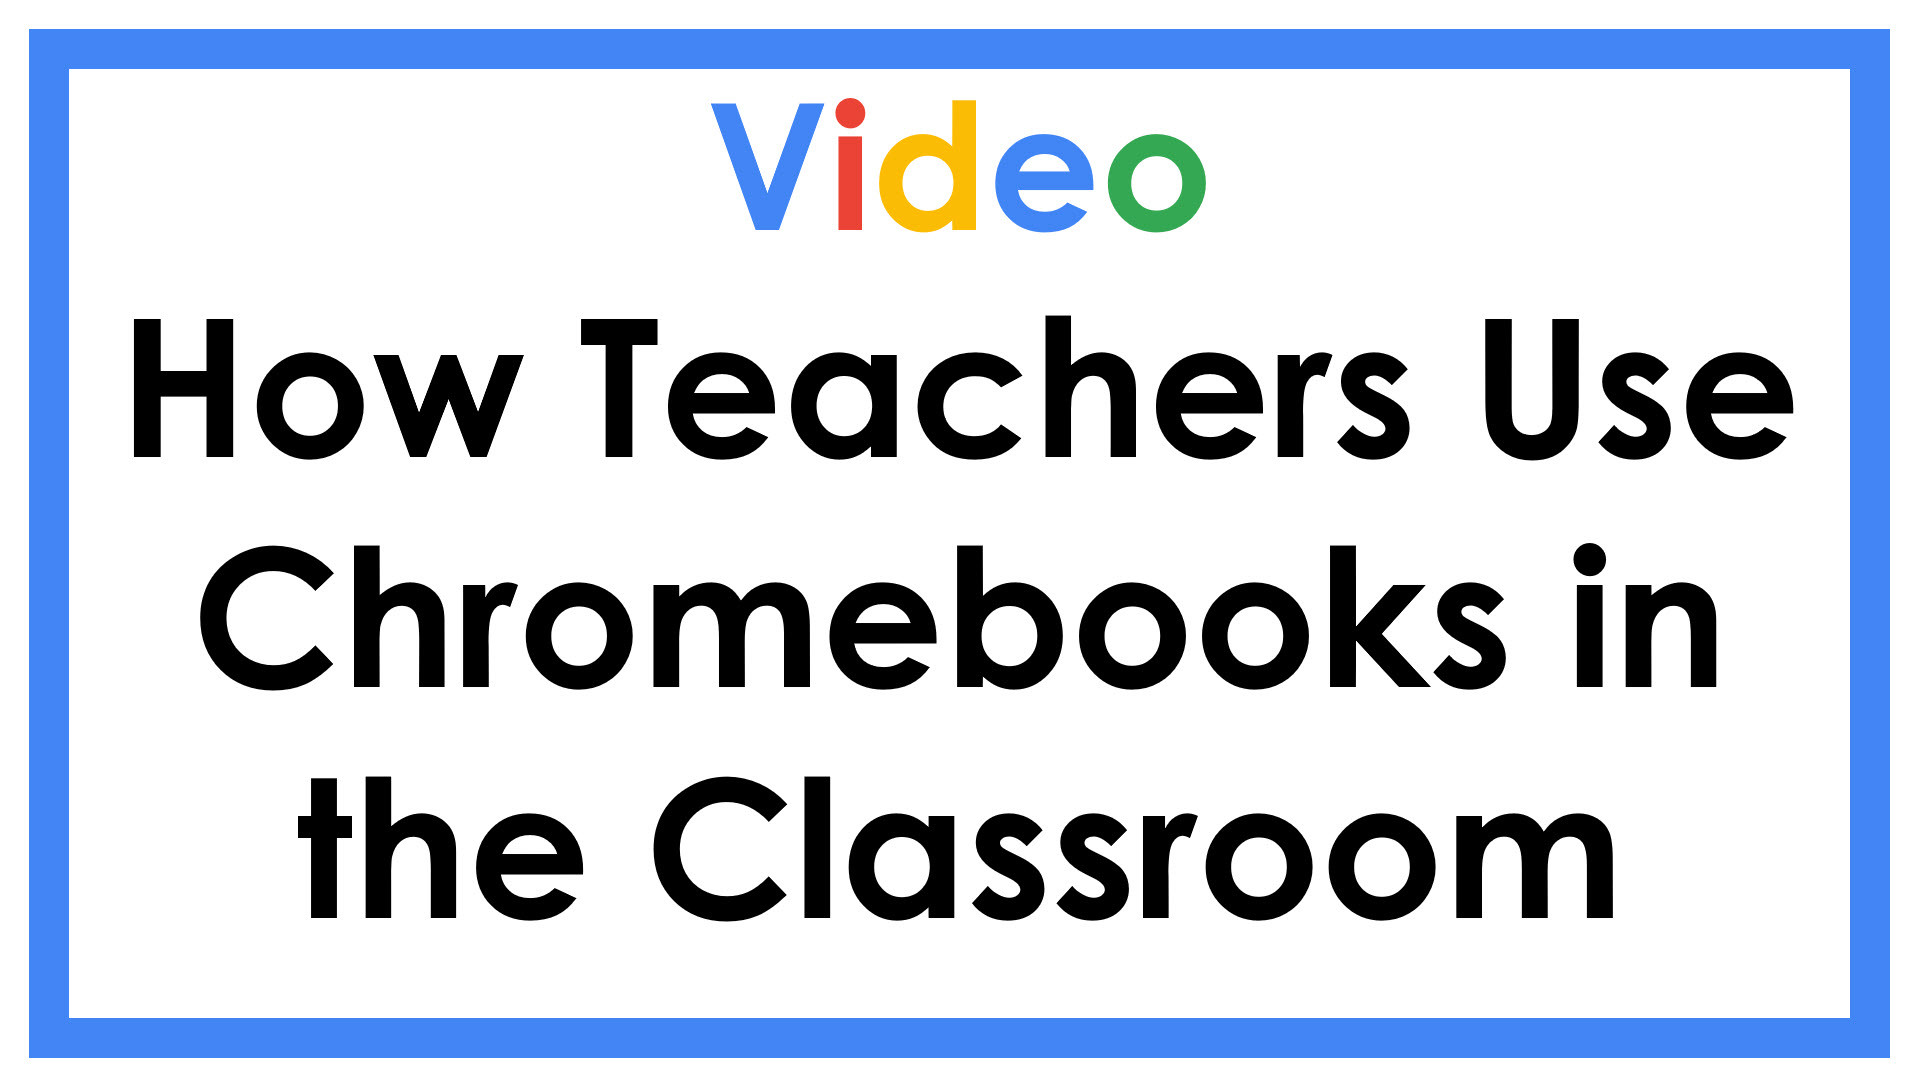 Video How Teachers Use Chromebooks in the Classrom